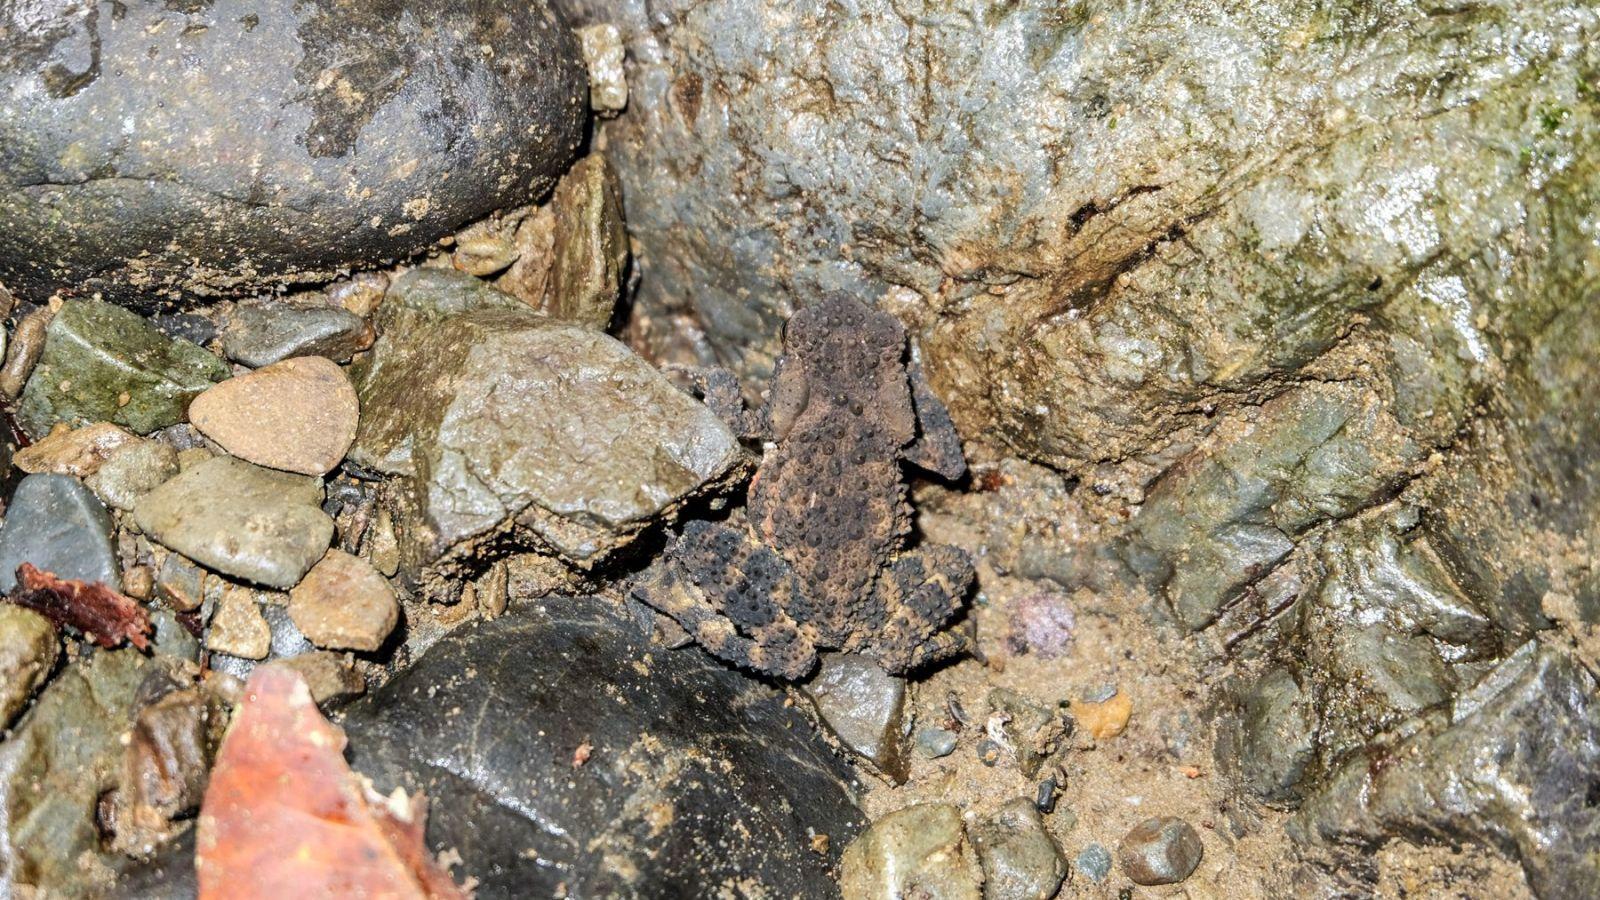 a photo of a toad in gunung leuser national park, sumatra.